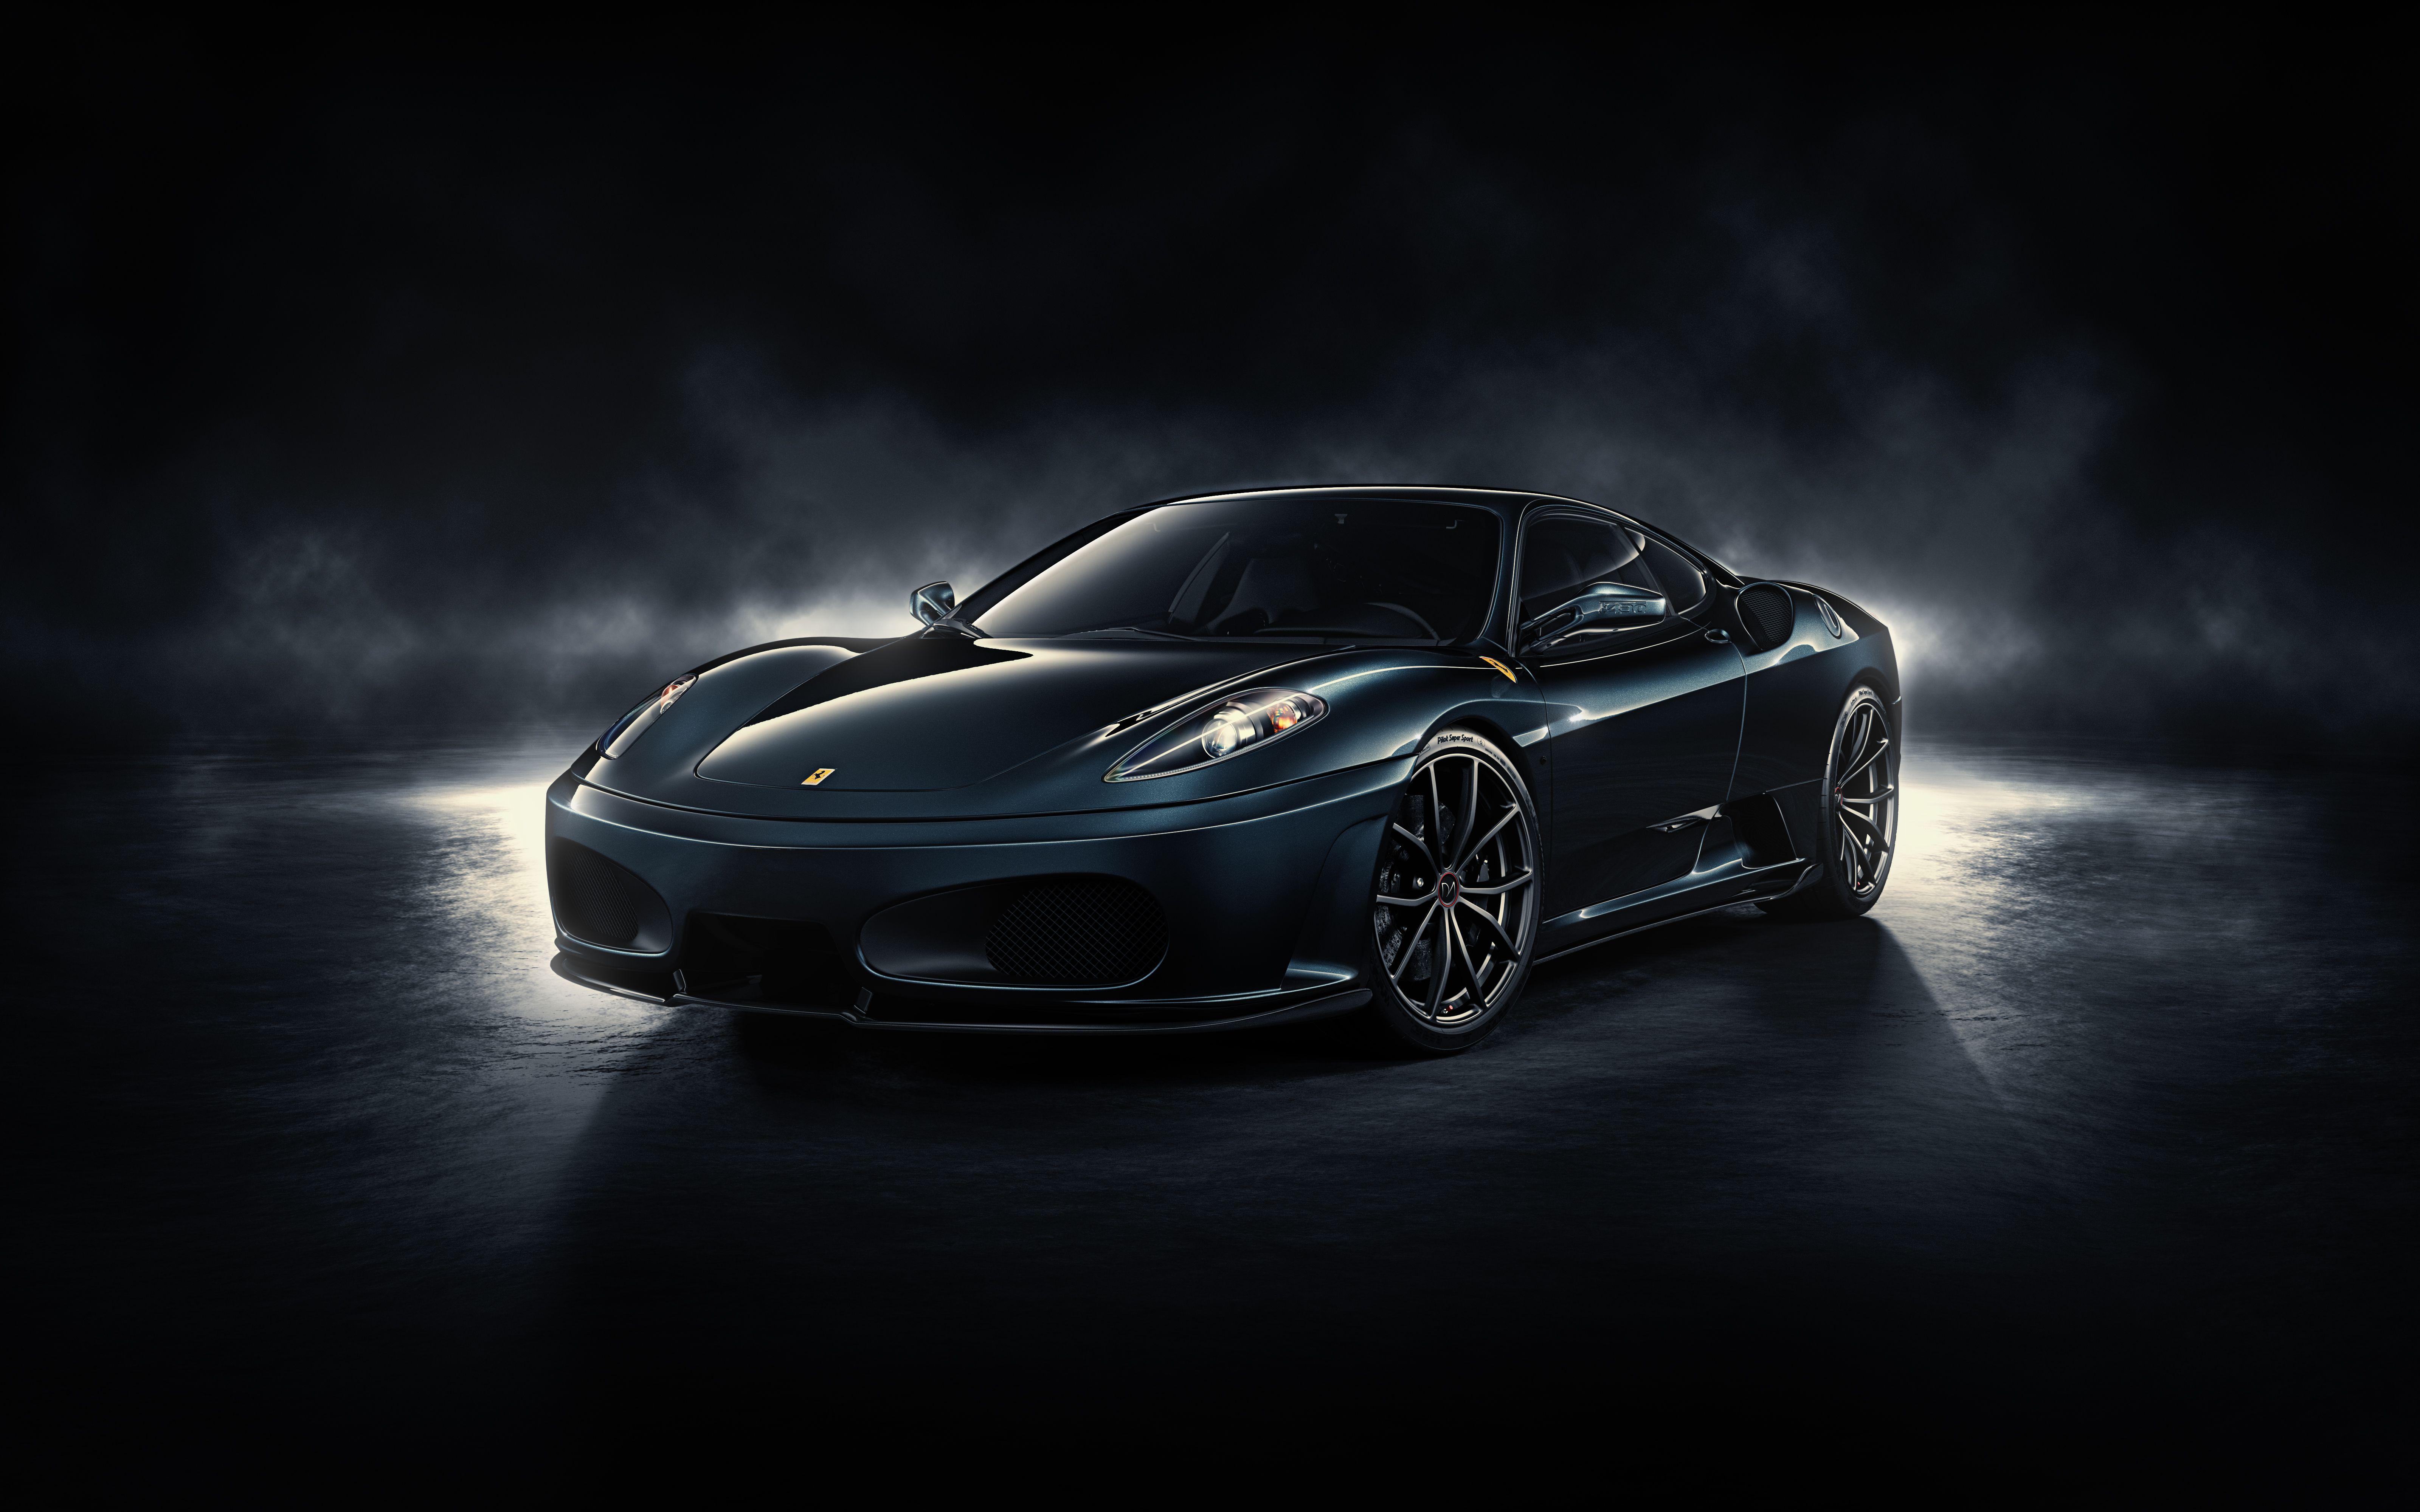 Ferrari f430 Black Wallpapers Images Photos Pictures ...